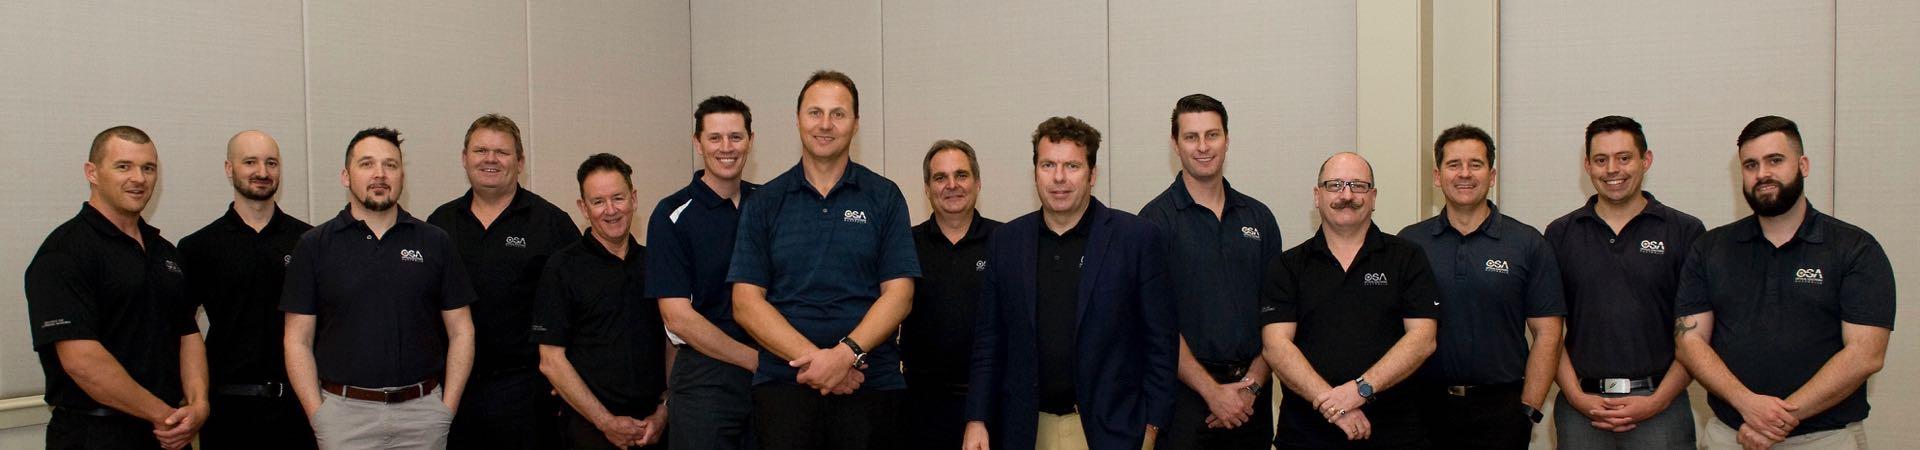 Optical Solutions Australia team